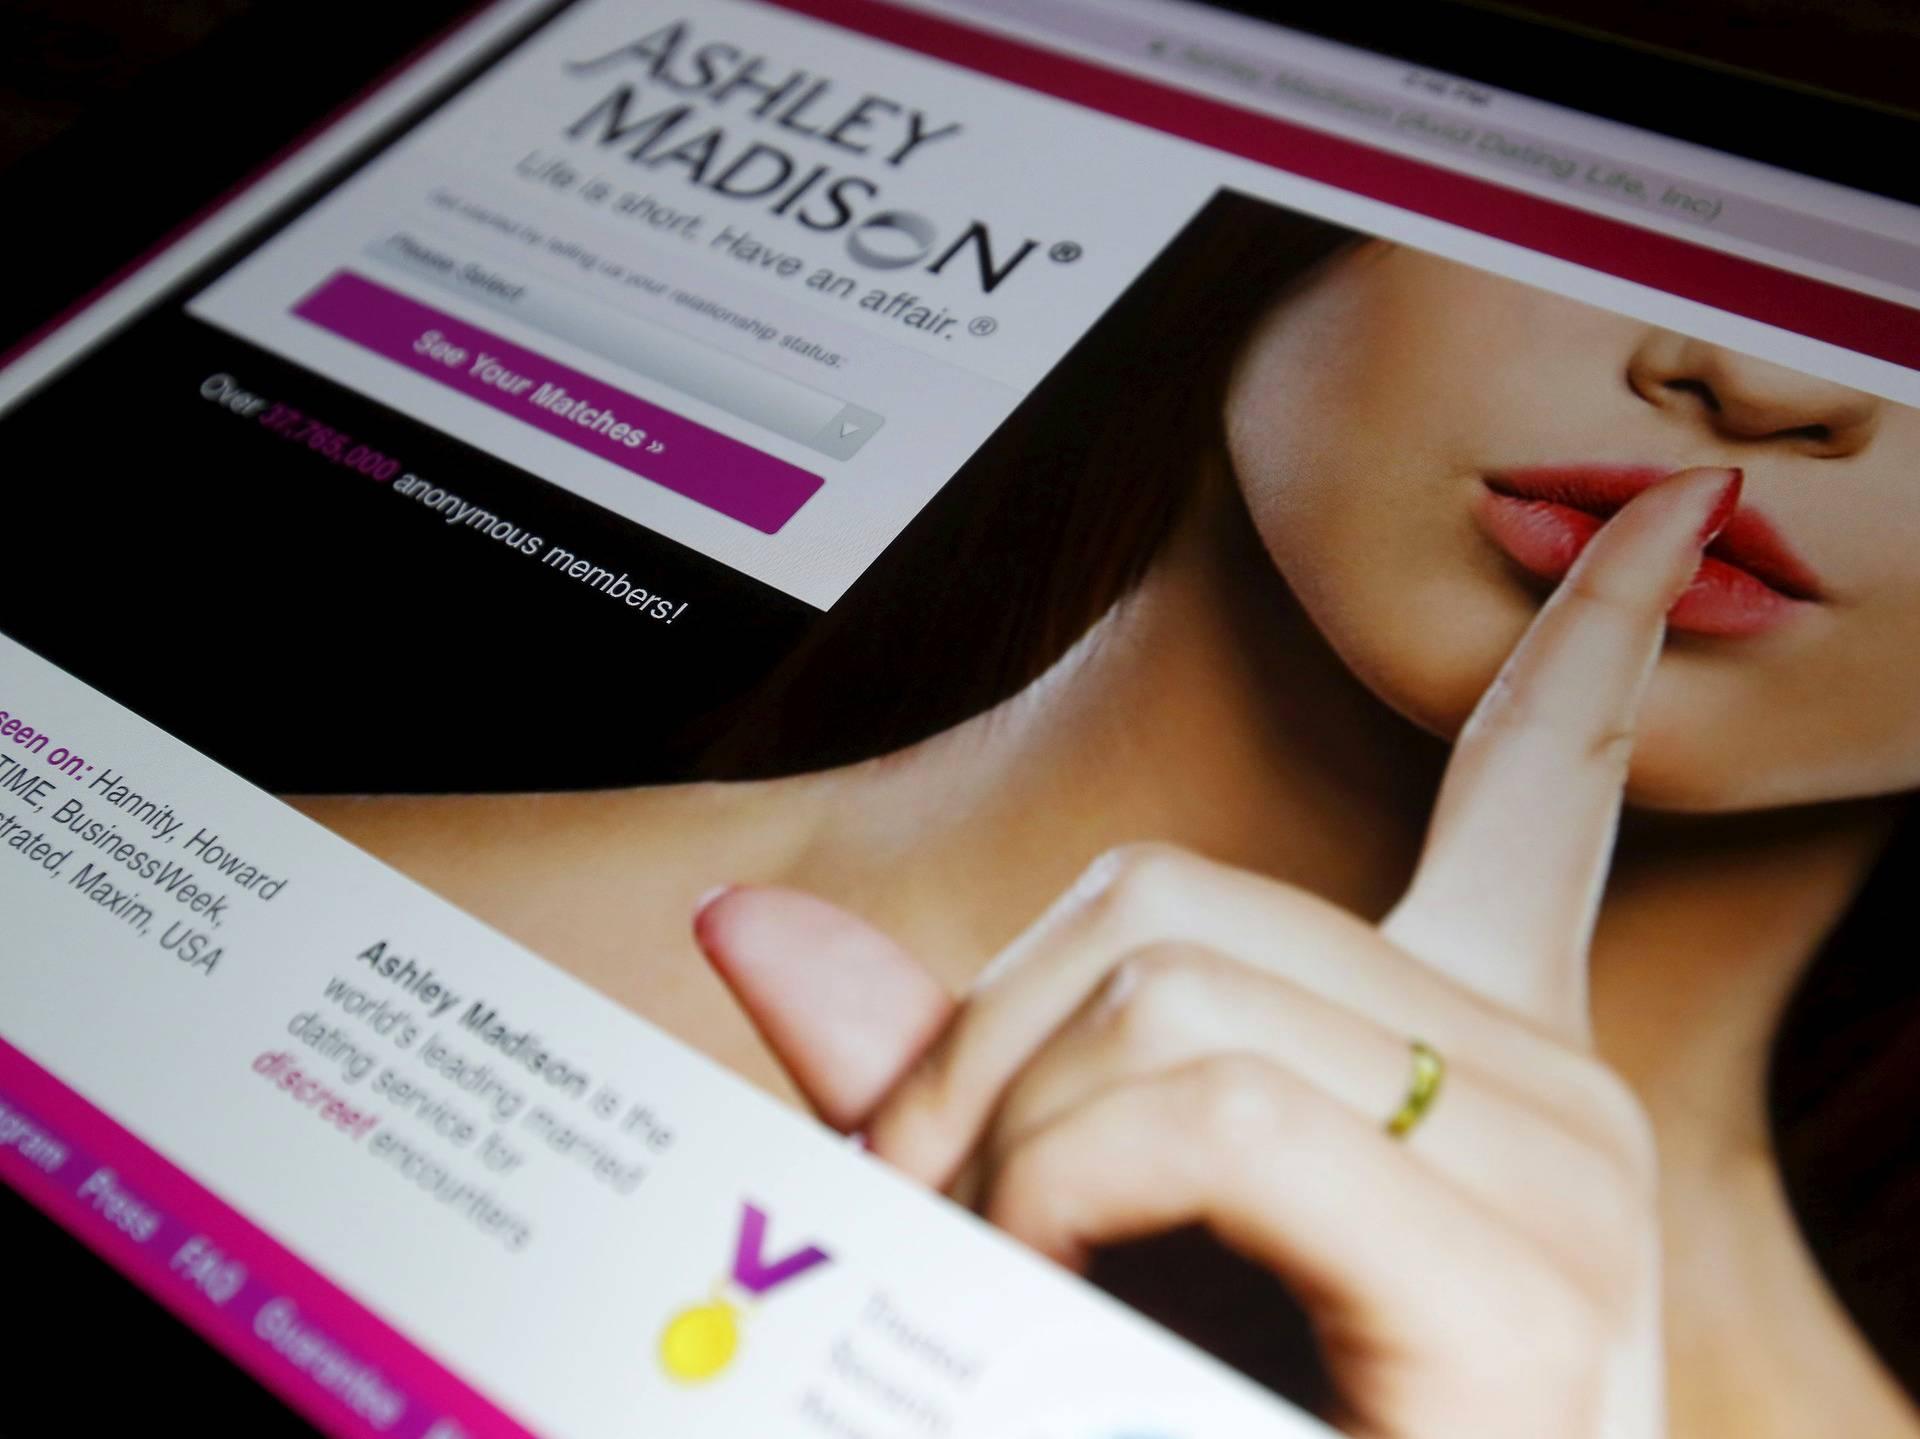 Paras online dating Sveitsi